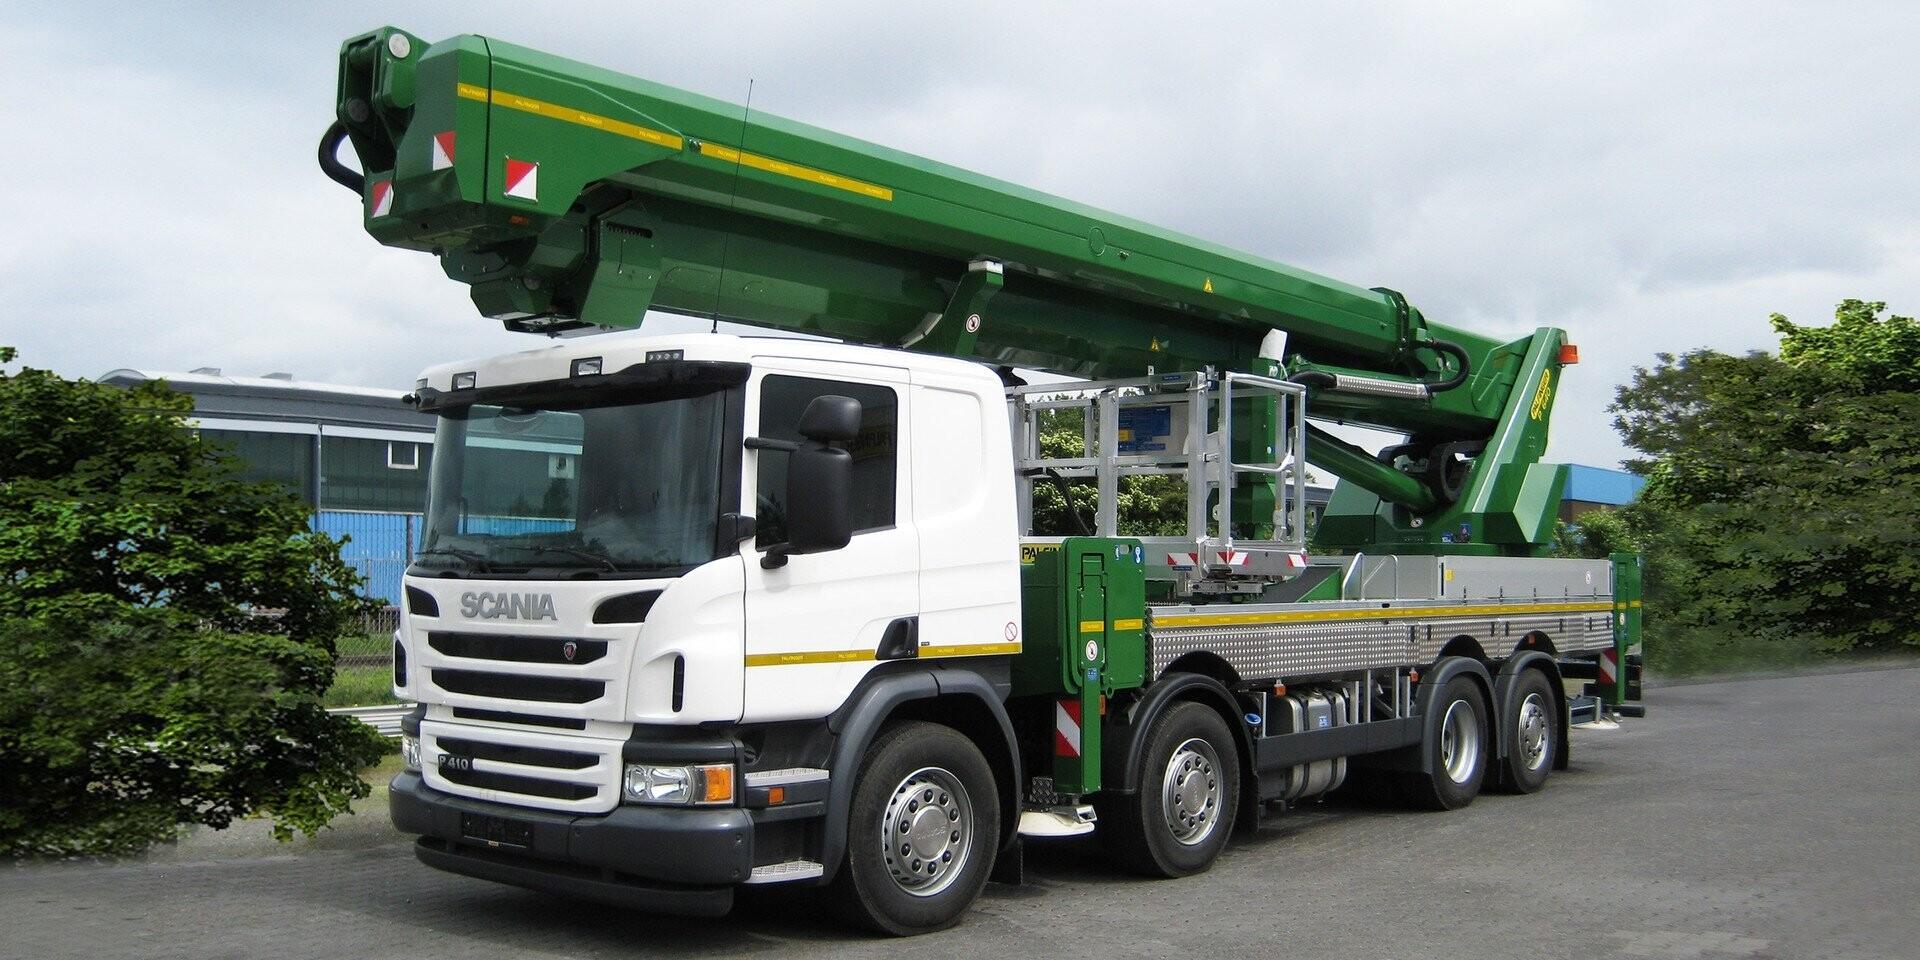 64m Truck Mounted Platform